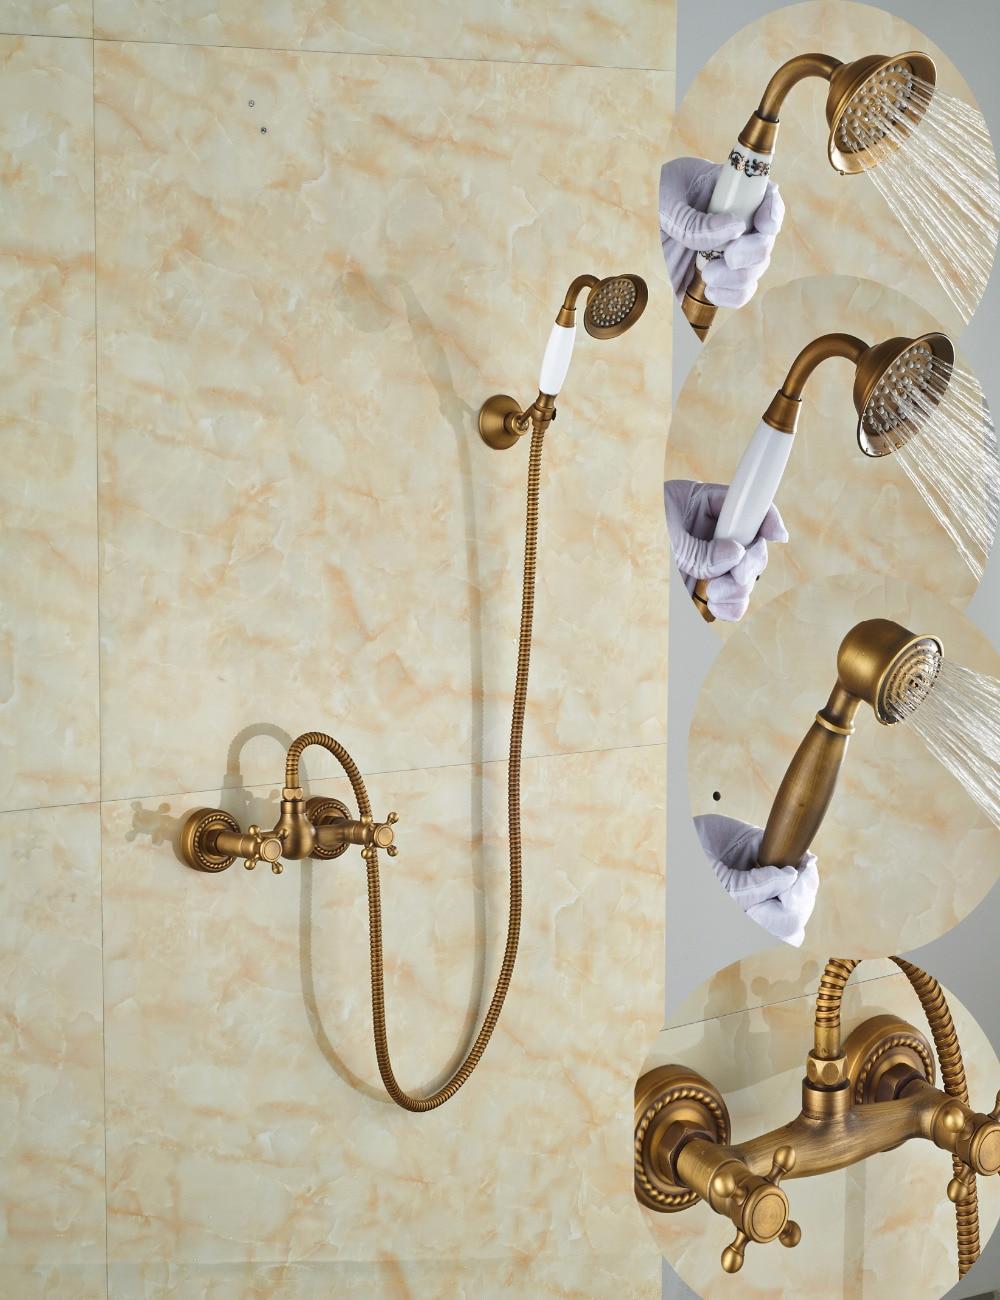 все цены на Wholesale And Retail Promotion Antique Brass Bathroom Rain Shower Faucet Dual Cross Handles Hand Held Shower Sprayer онлайн